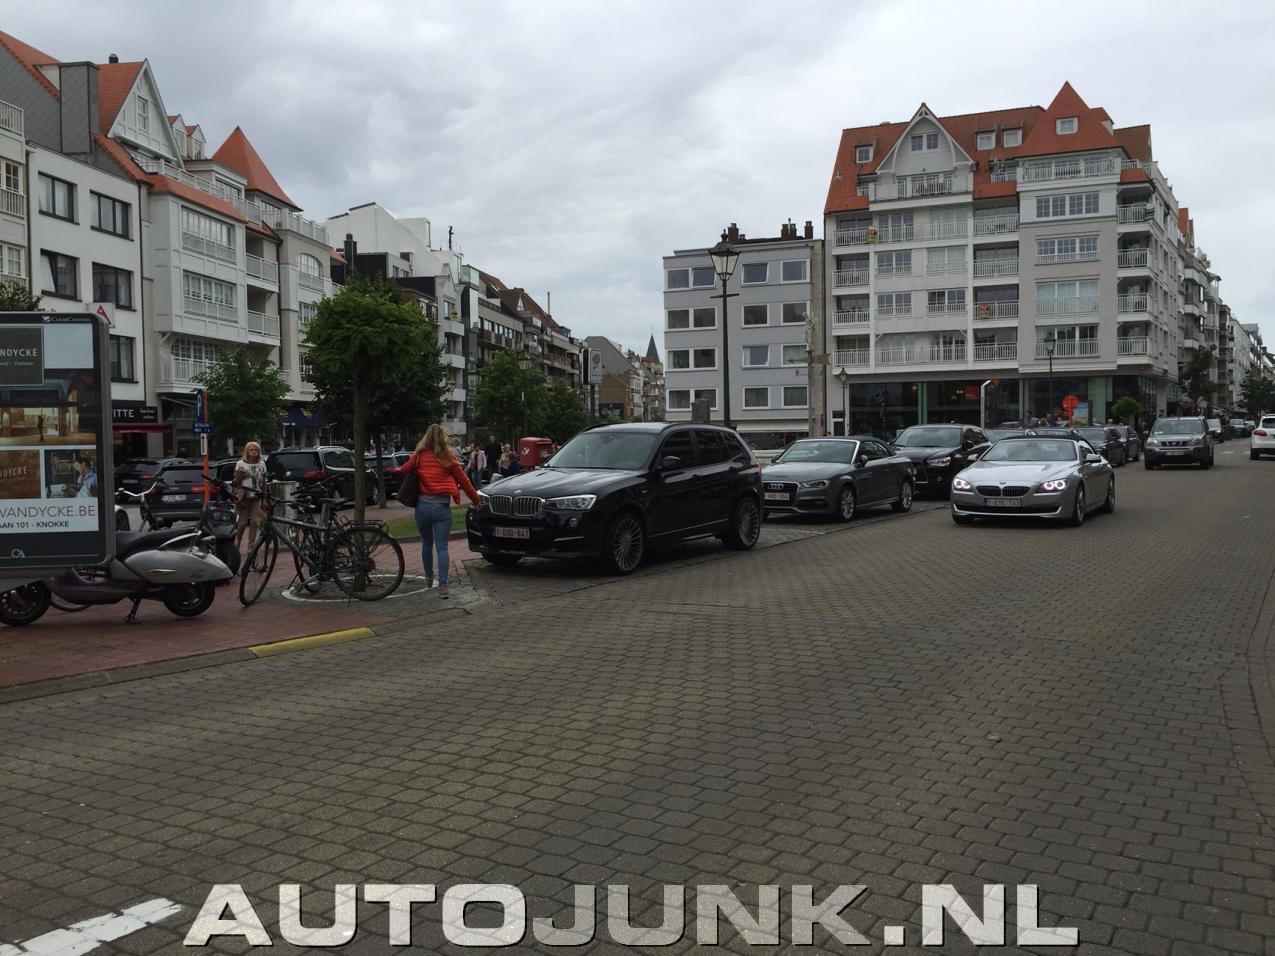 alpina x5 foto's » Autojunk.nl (146166)